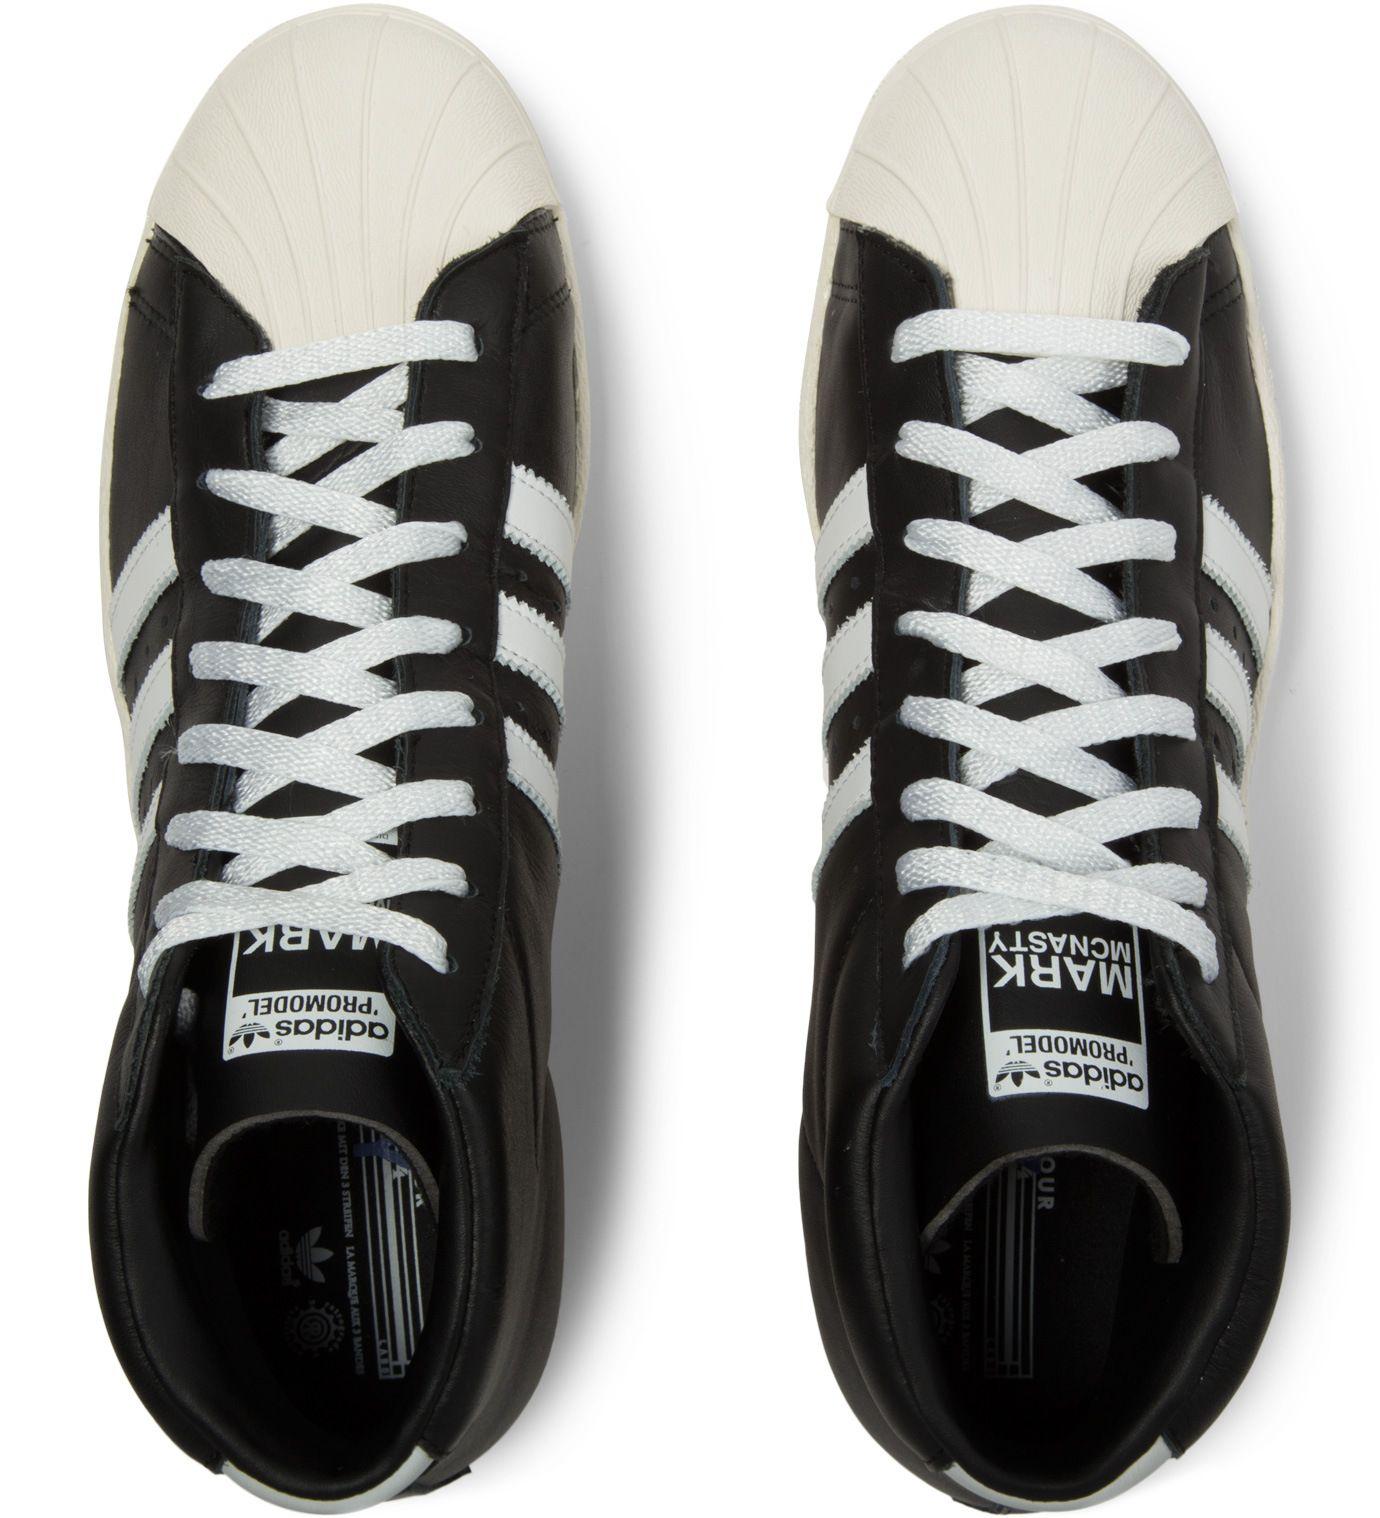 BlackWhite MCN Pro Model 84 LAB Shoes | Shoes, Adidas